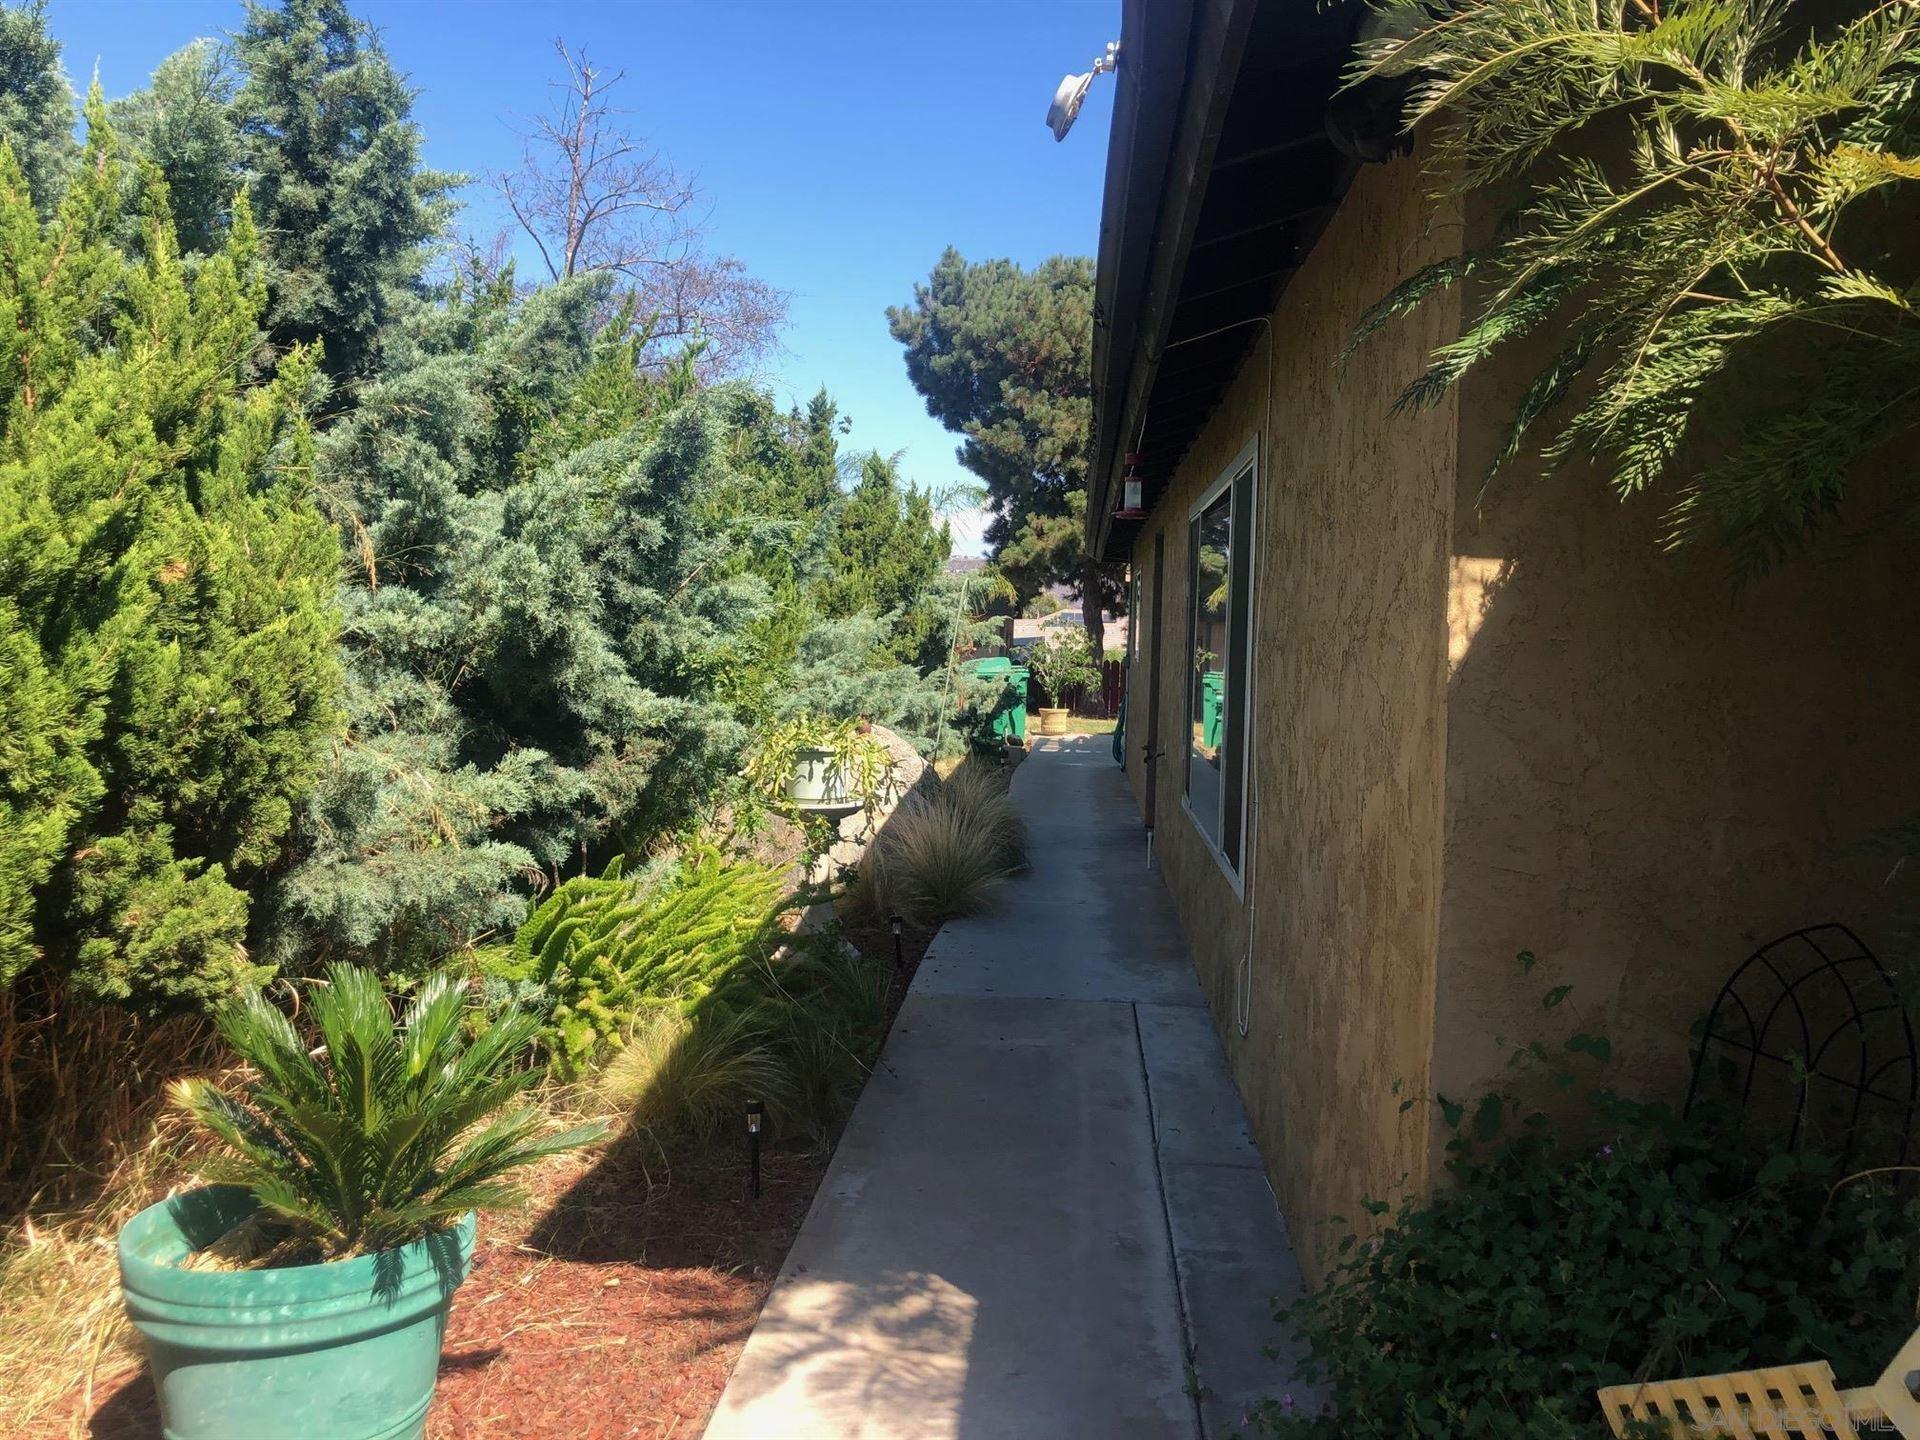 Photo of 8577 Atlas View Dr, Santee, CA 92071 (MLS # 210026068)